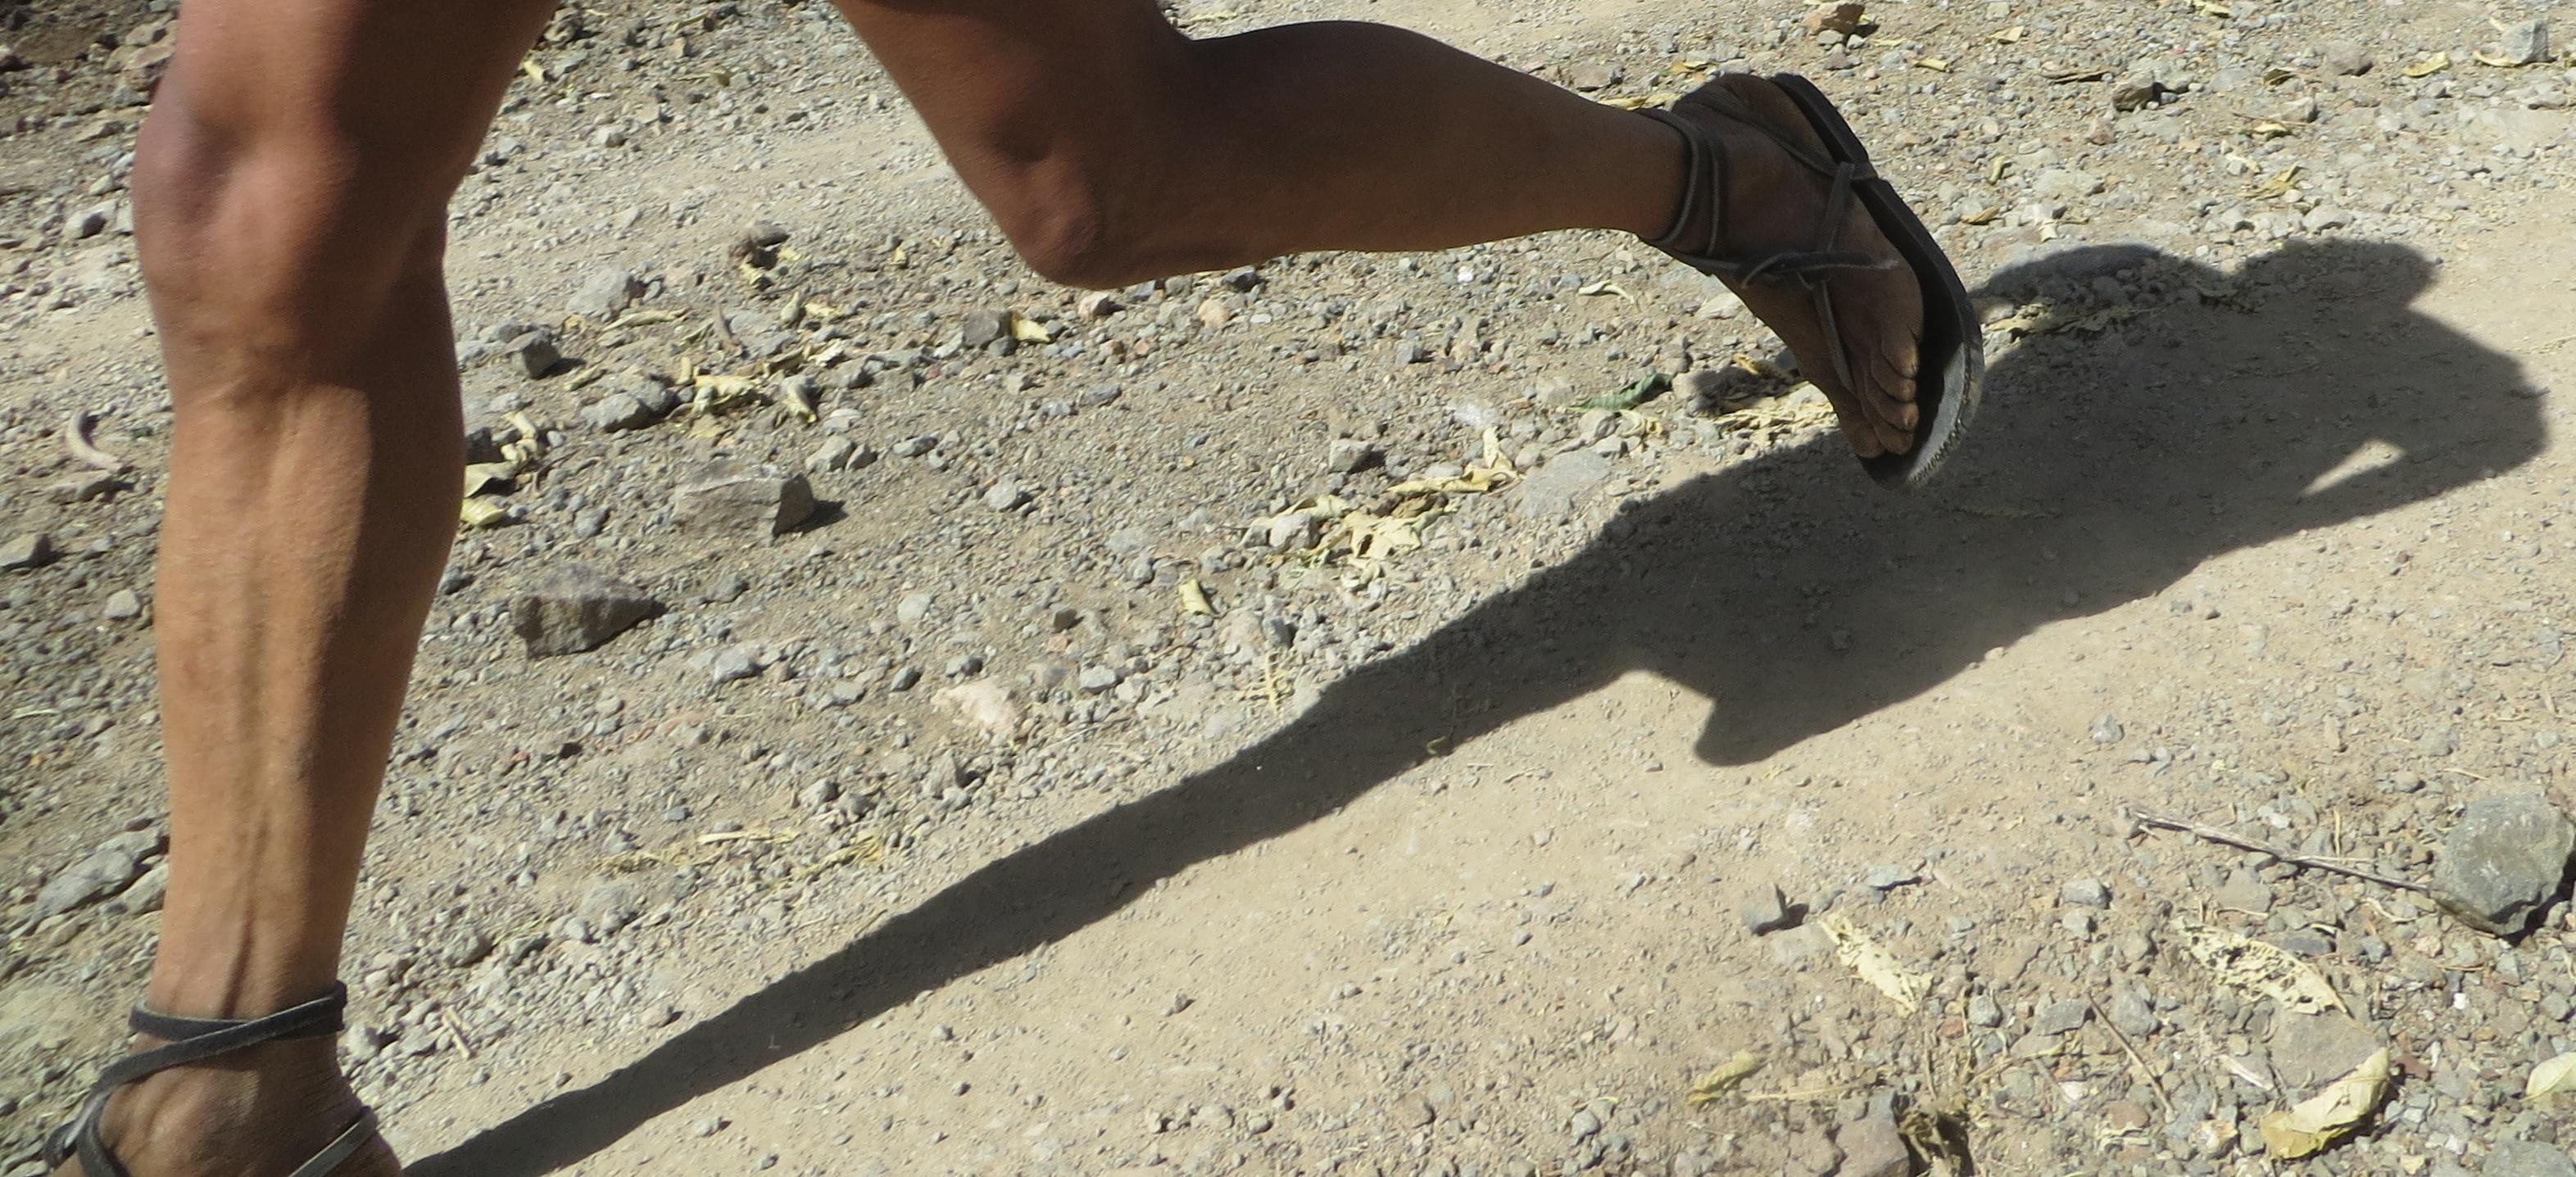 Ultramaraton Caballo Blanco 2015 Running With The